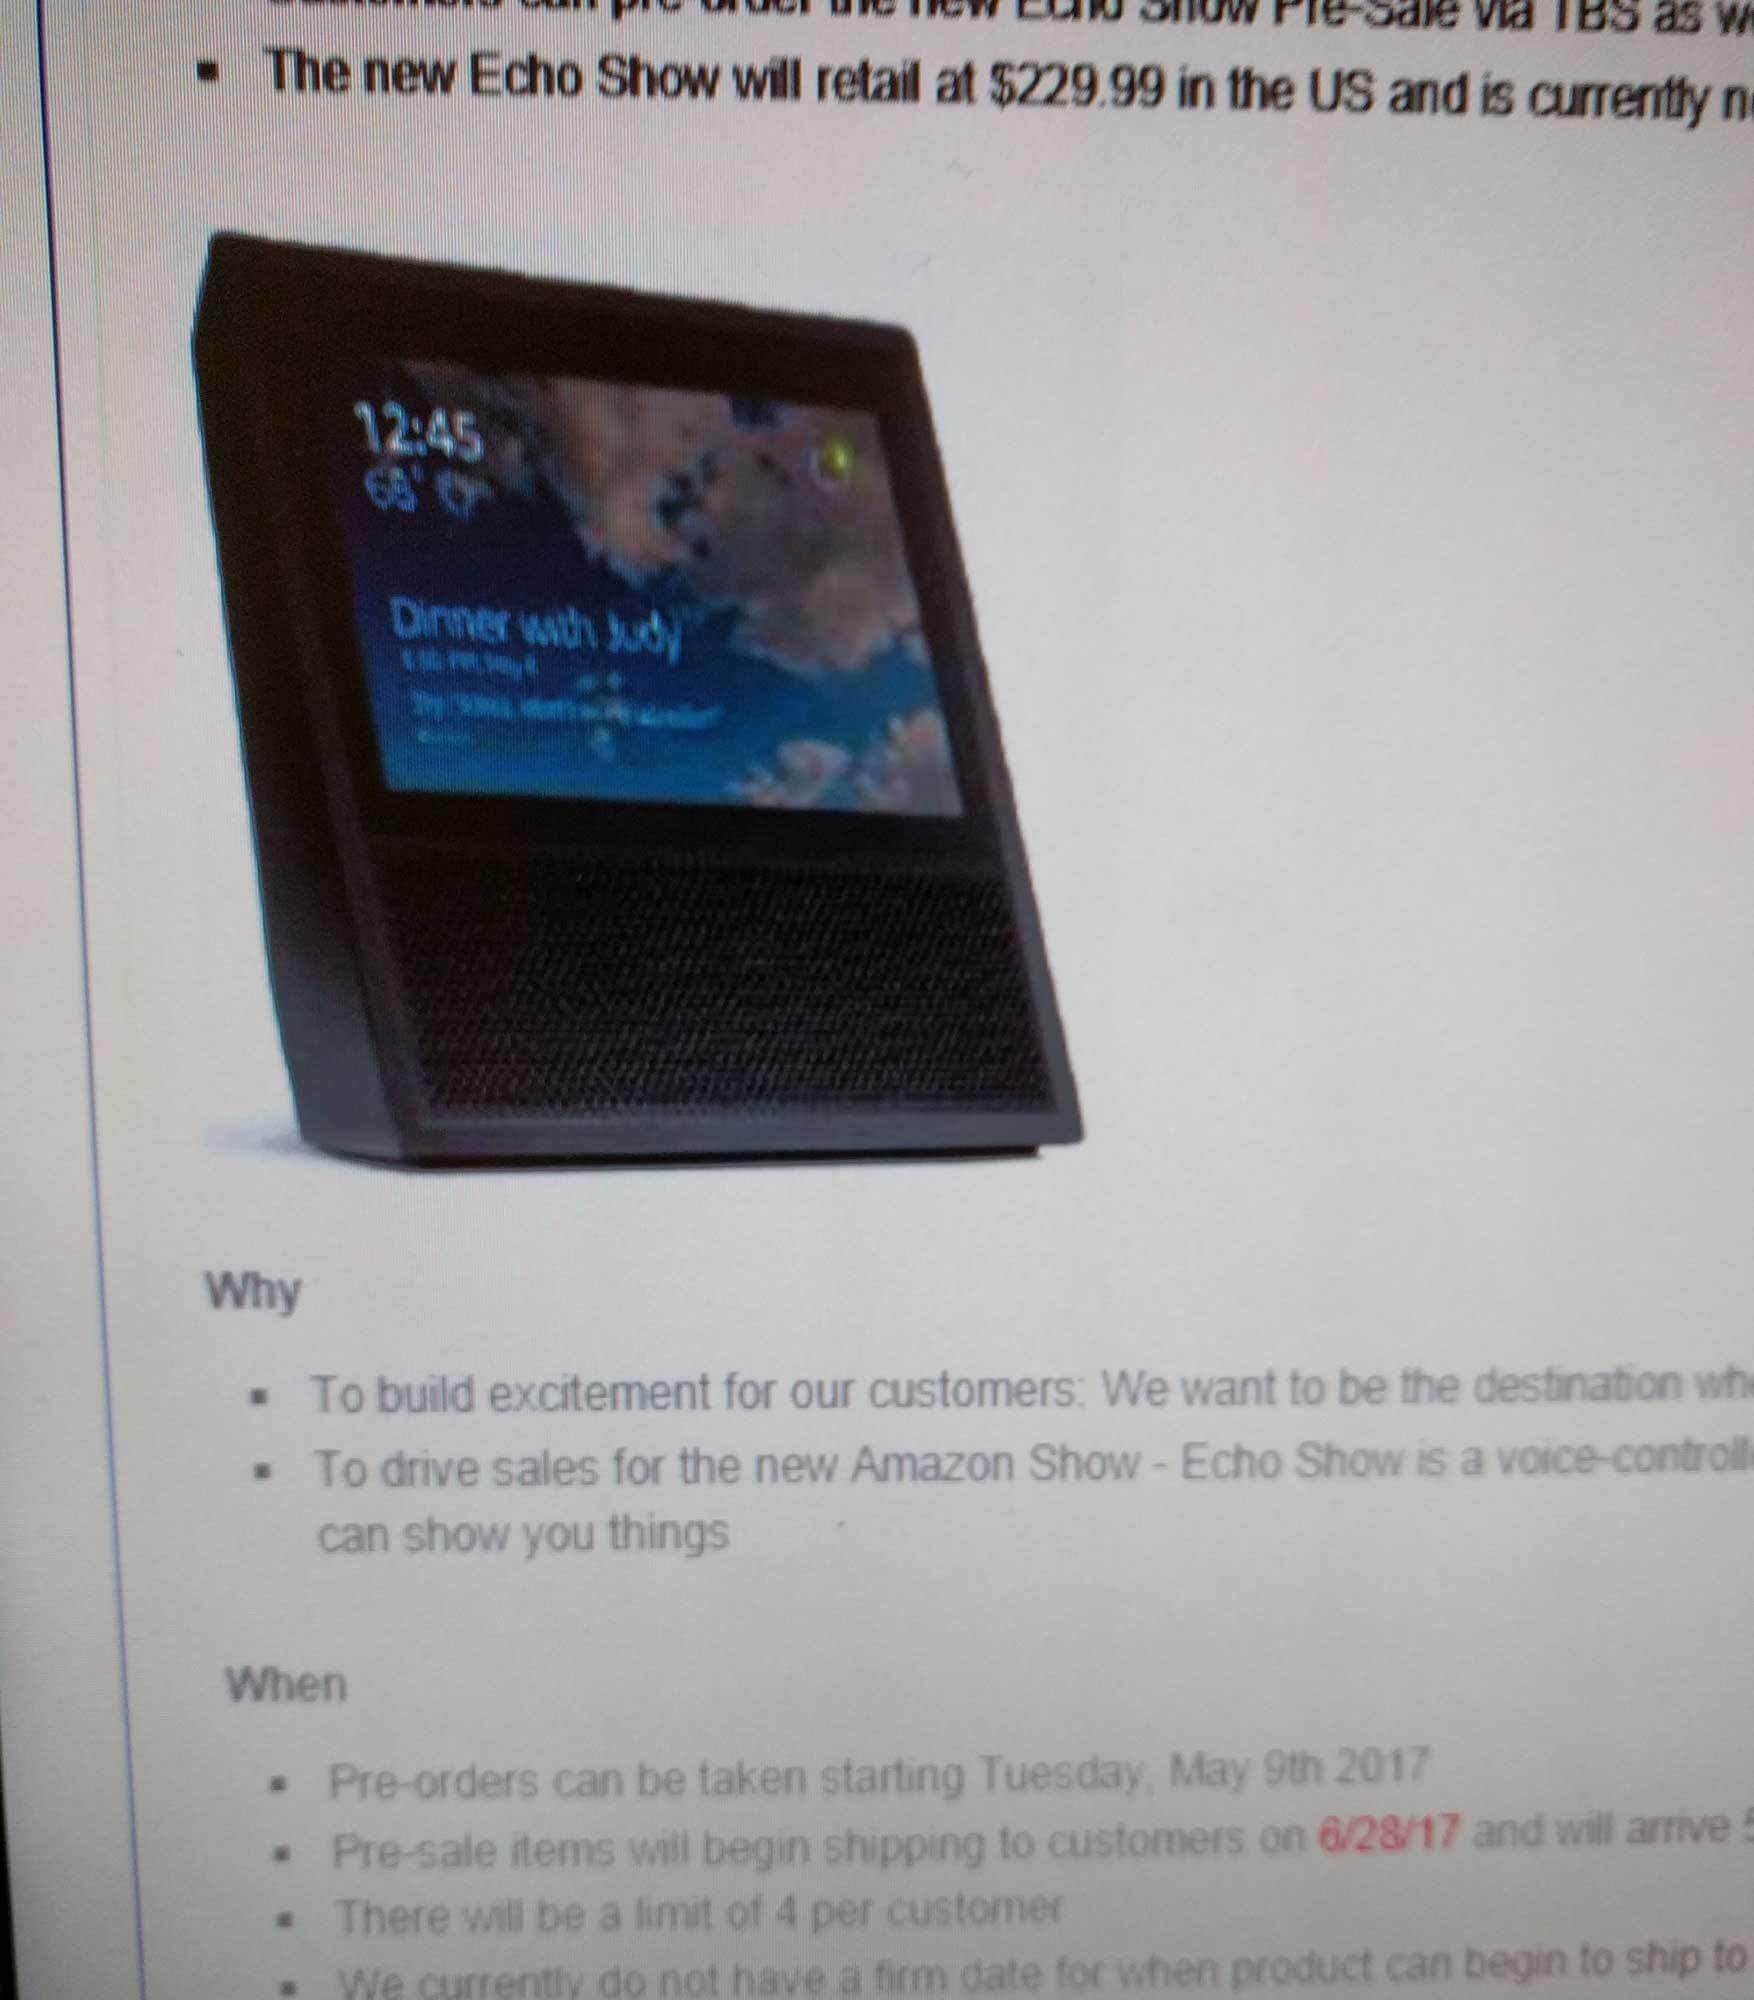 Amazon Echo Show (Verpackung) - aftvnews.com